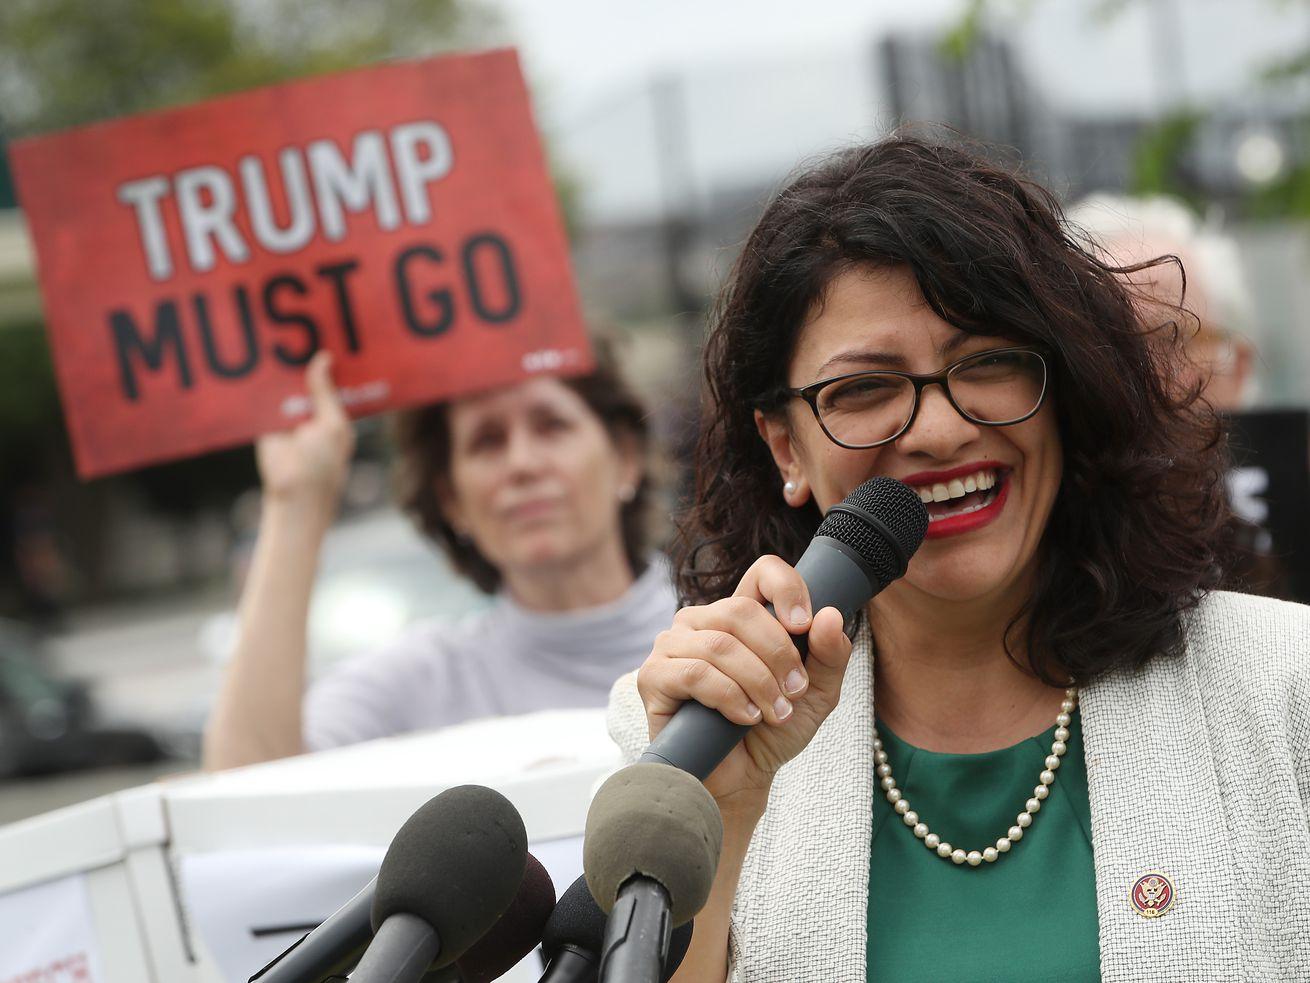 Rep. Rashida Talib (D-MI) at an impeachment rally in Washington, DC.